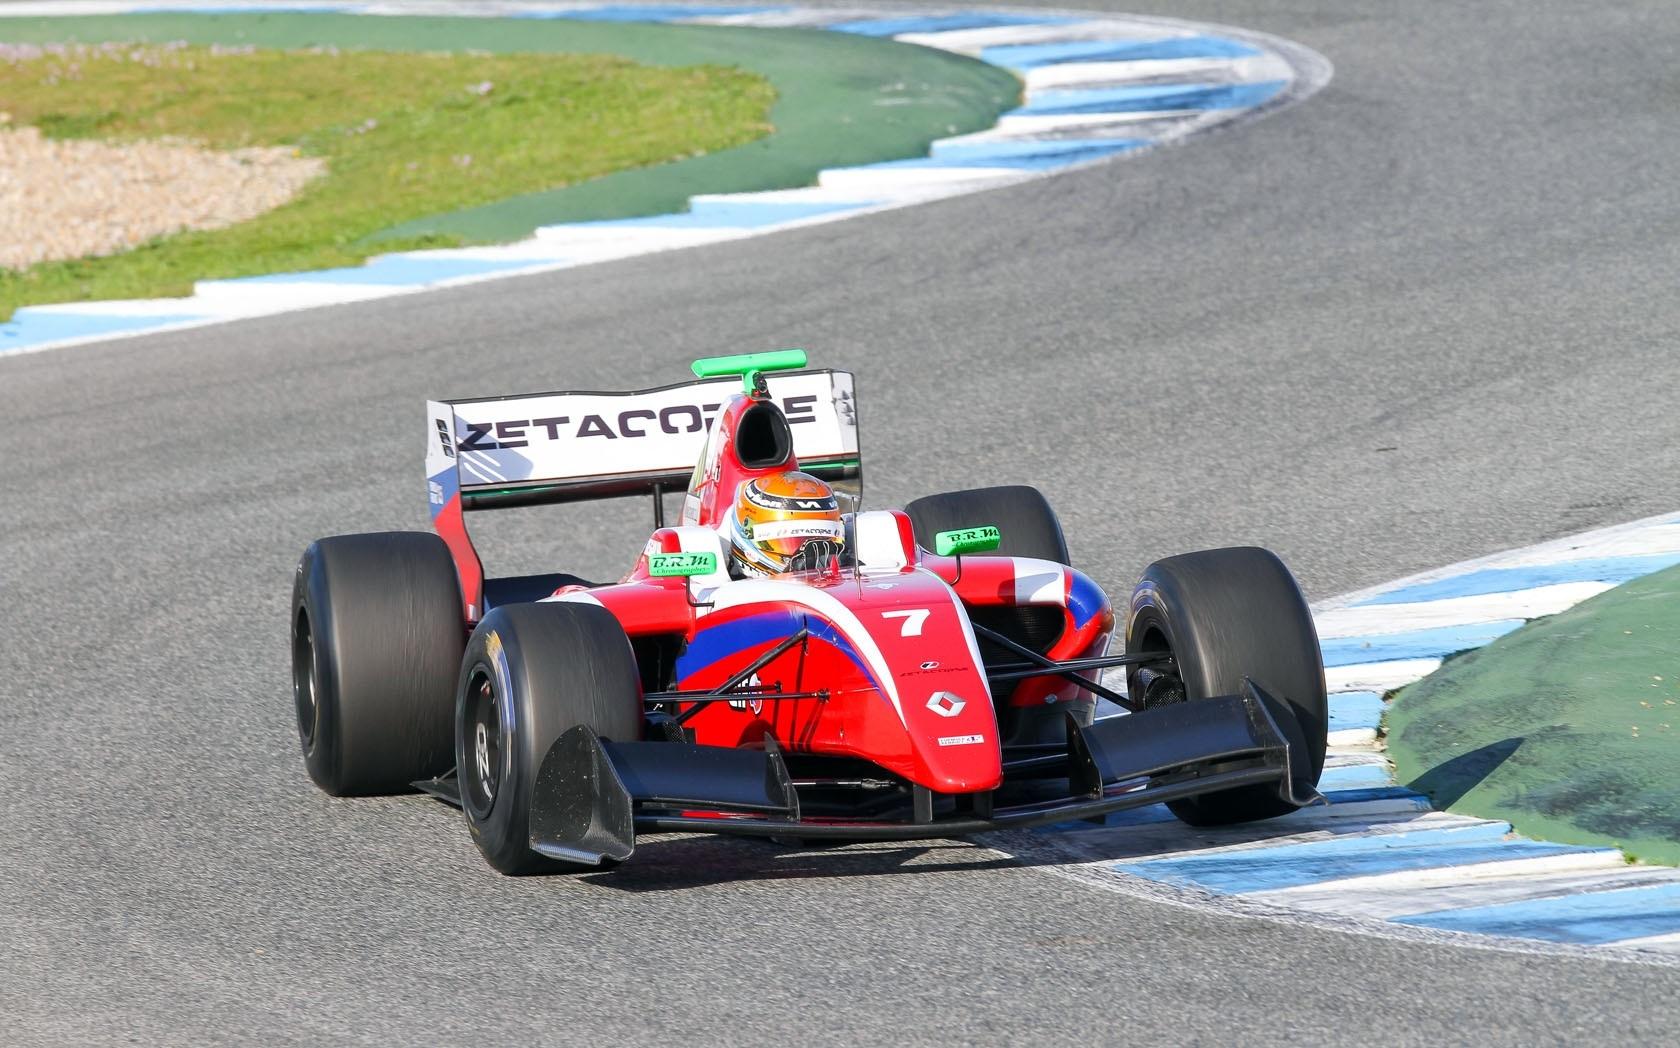 Facu Regalia FR3.5 Zeta Corse test Jerez 2015